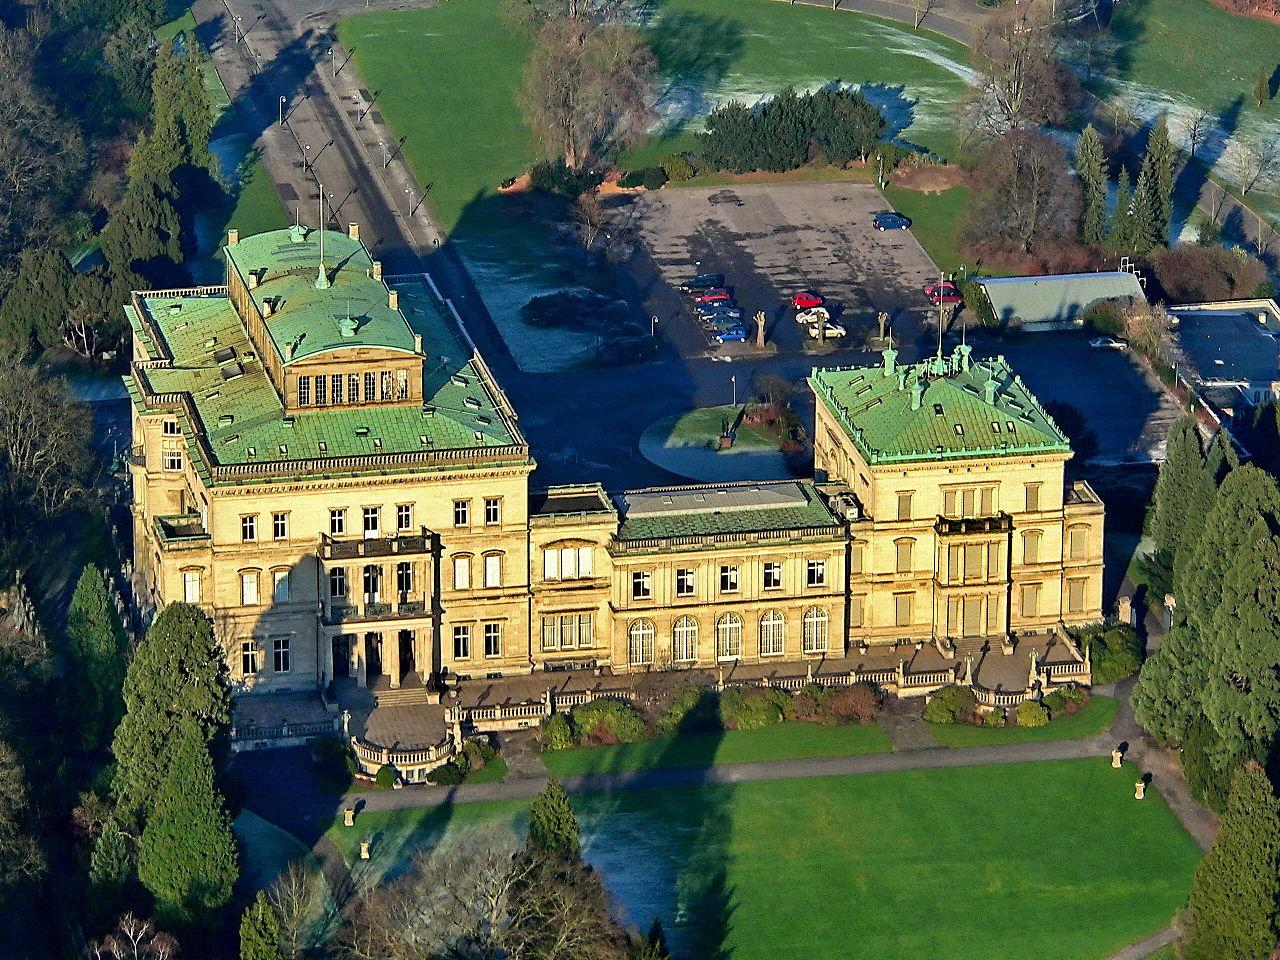 Bild Villa Hügel Essen